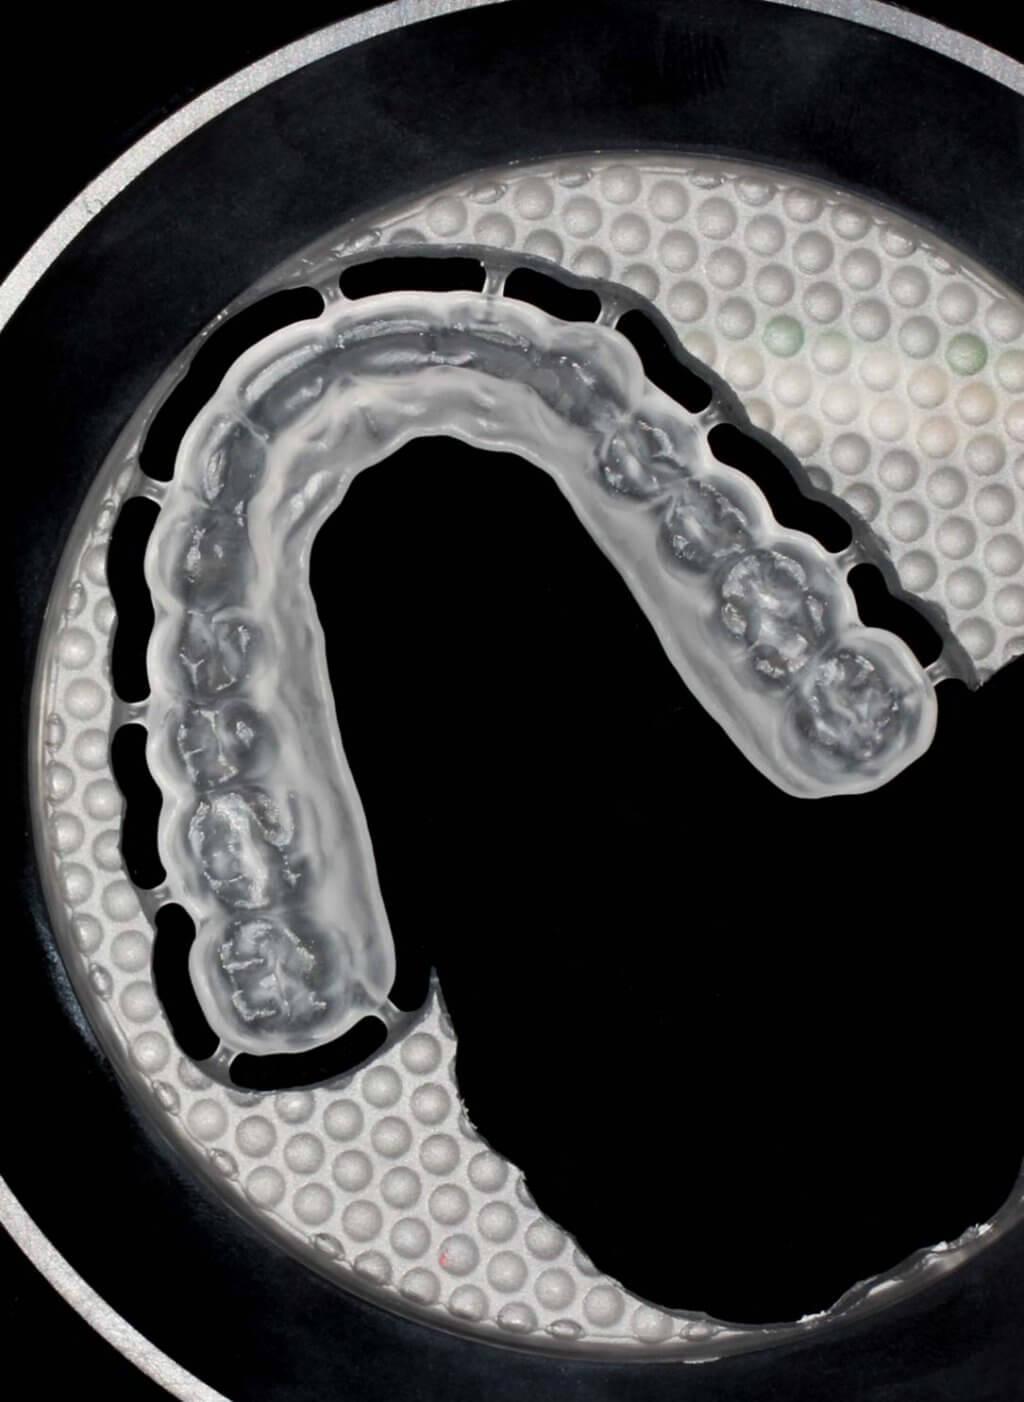 innovatie | Barnevelds Tandtechnisch Laboratorium